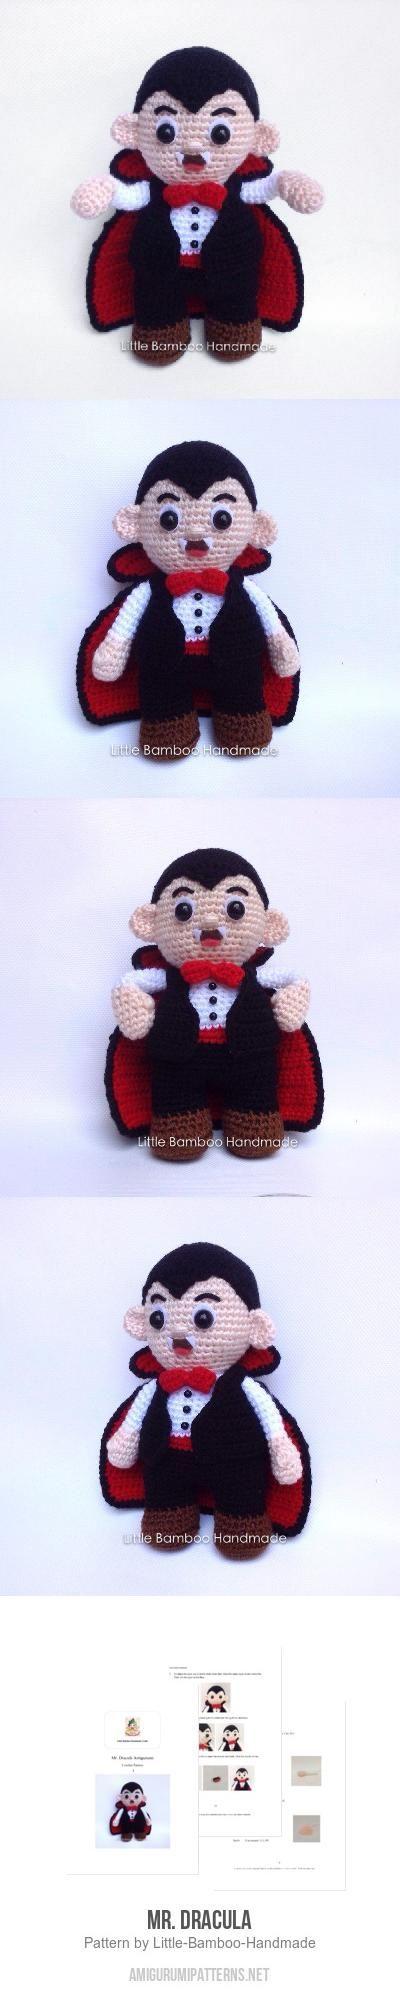 Mr. Dracula Amigurumi Pattern